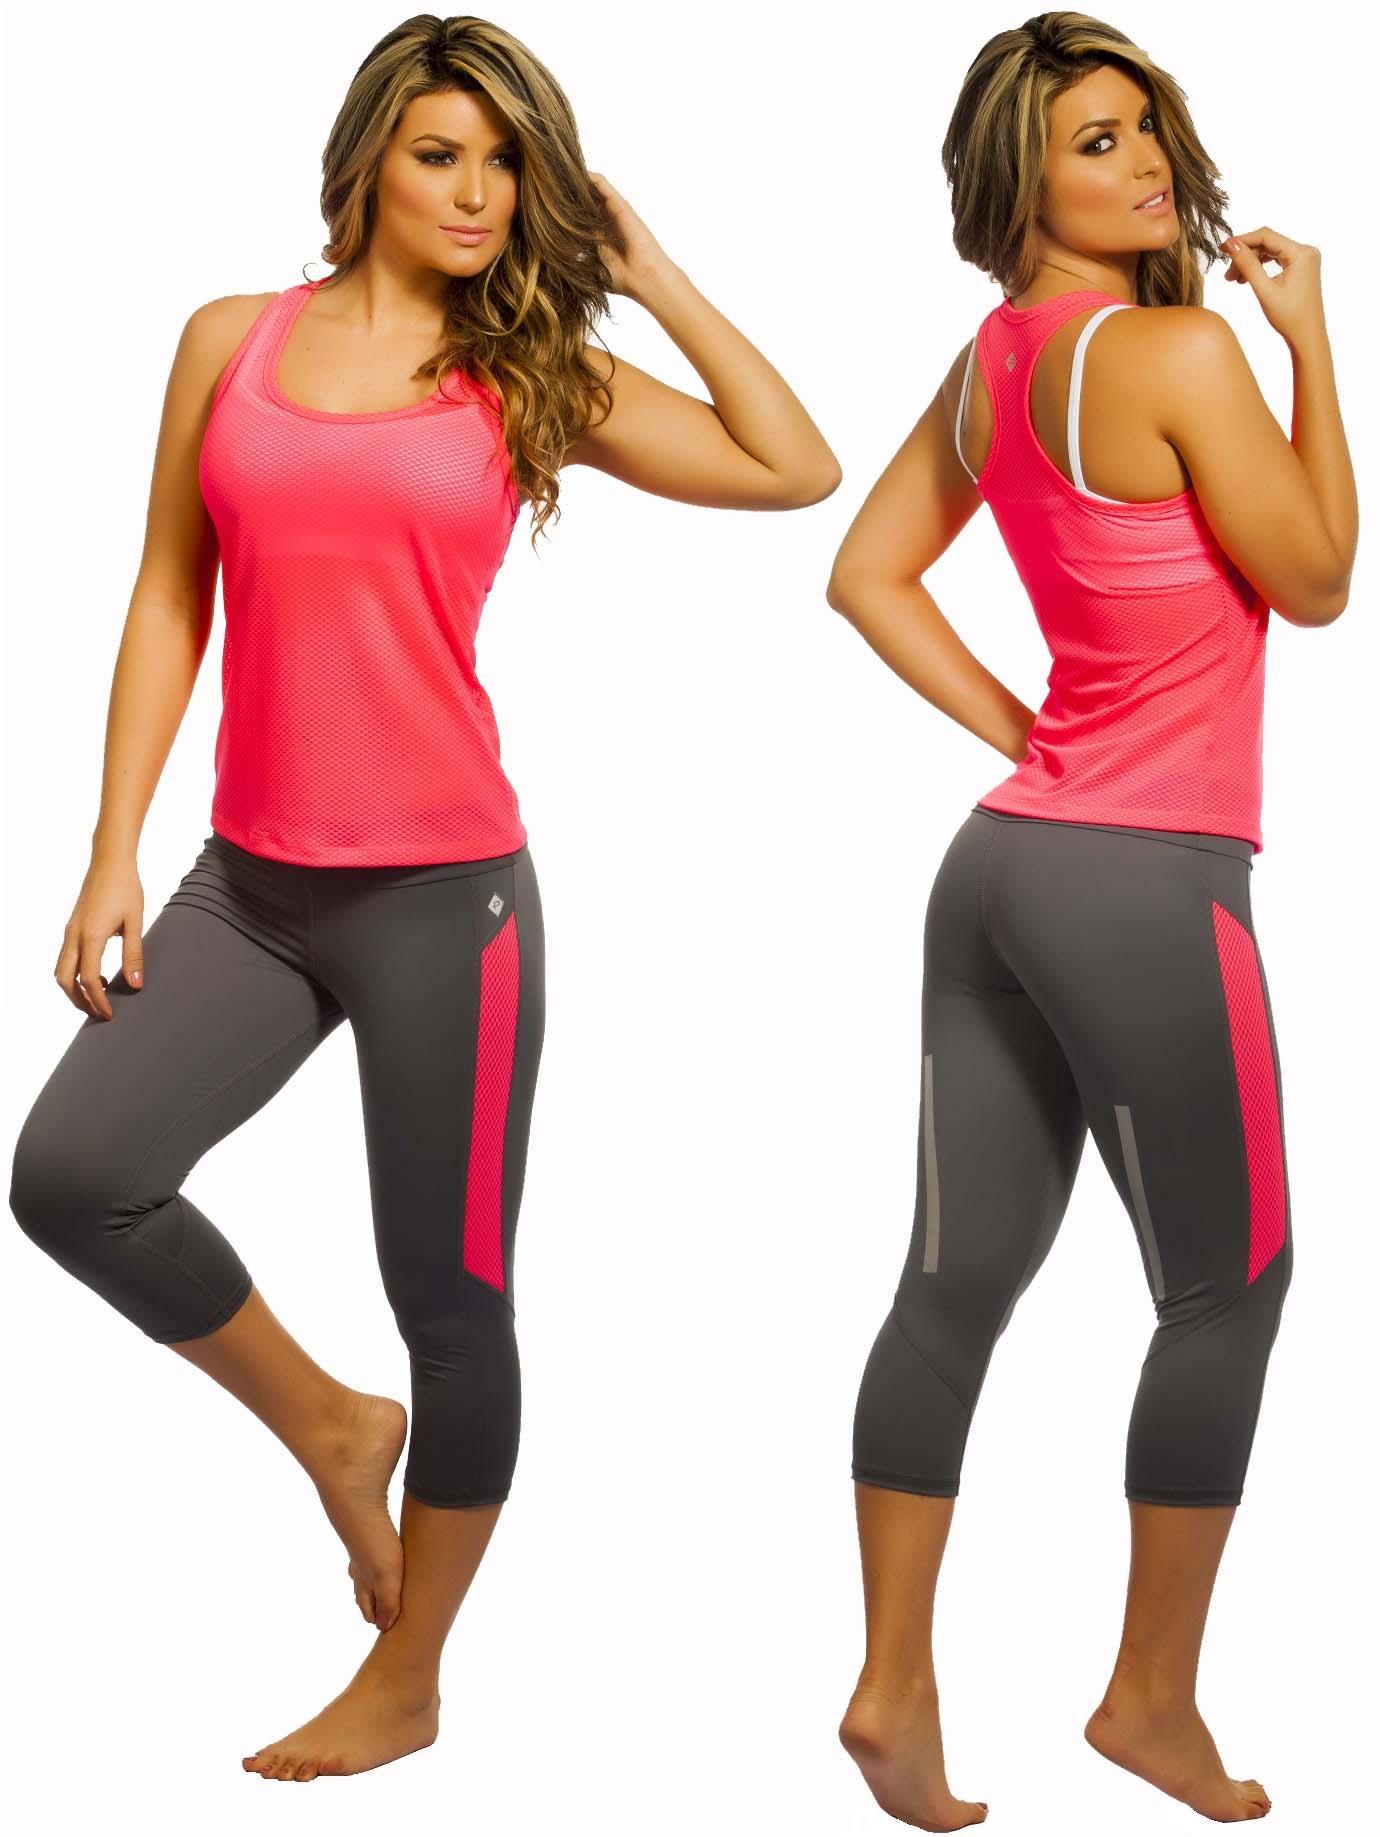 womens gym wear protokolo-top-070-capri-2694 ZDVFBJW